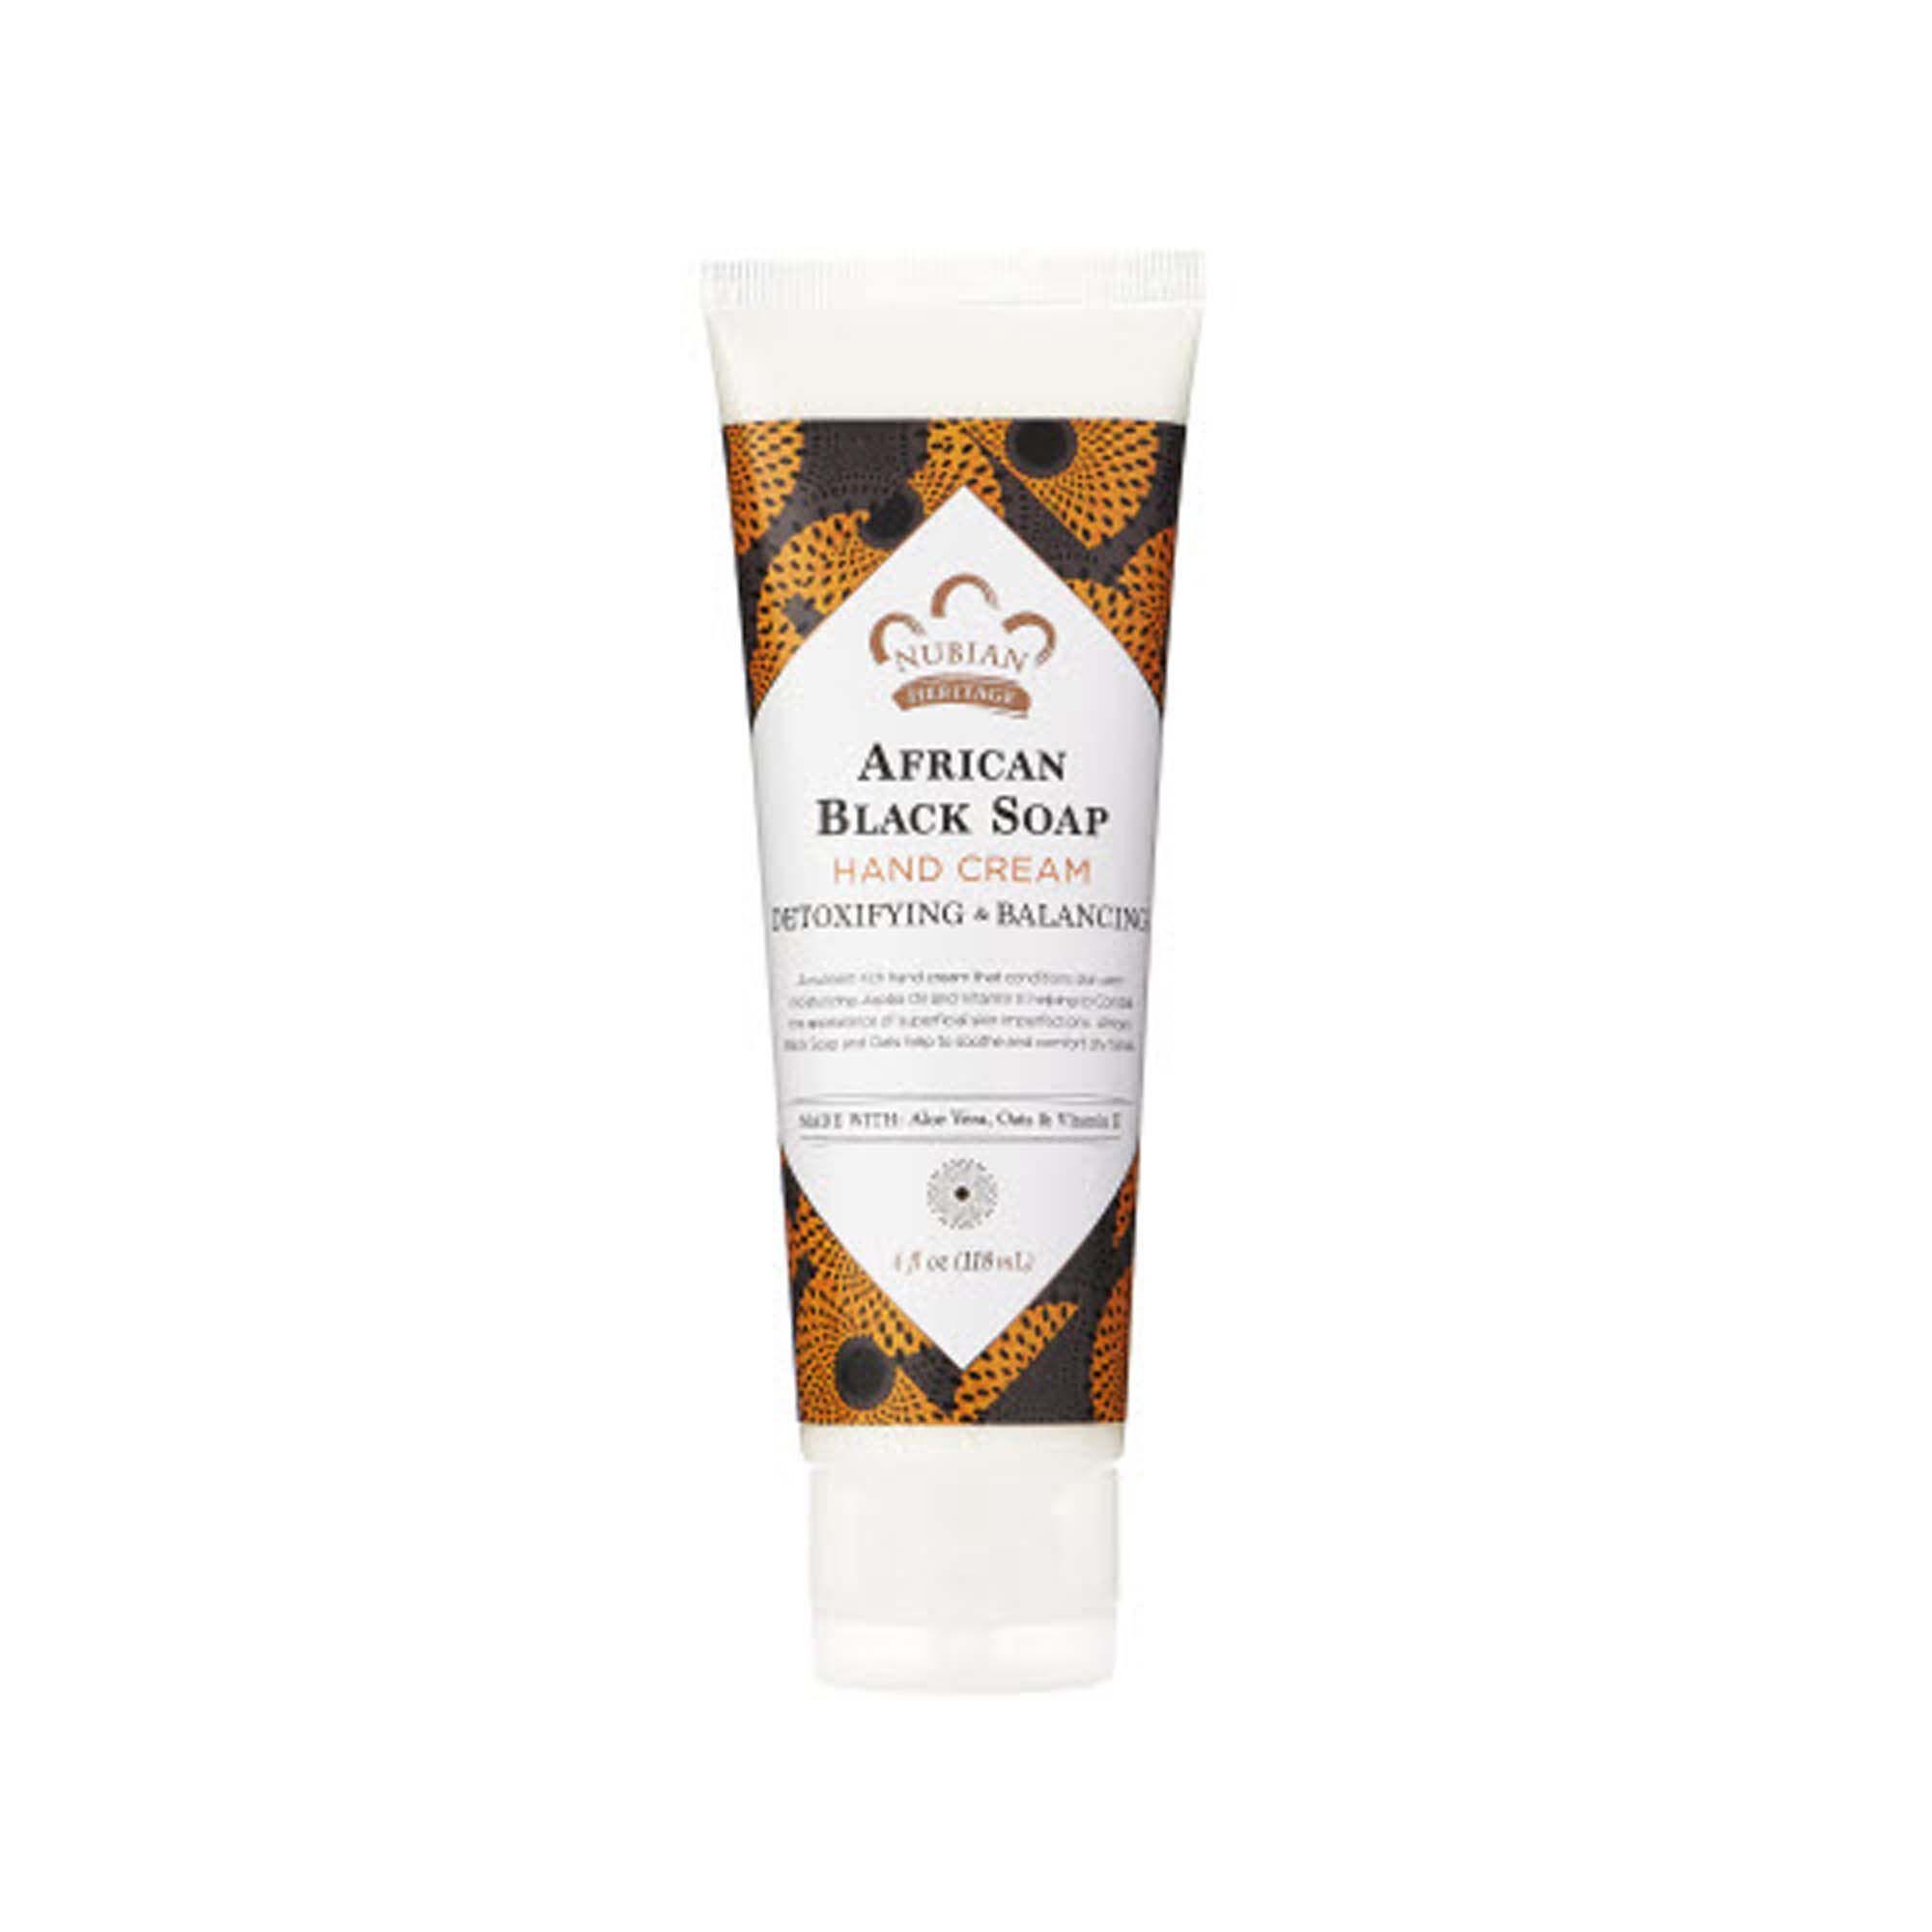 African Black Soap Hand Cream 4 Oz(s) Nubian Heritage Hand Care